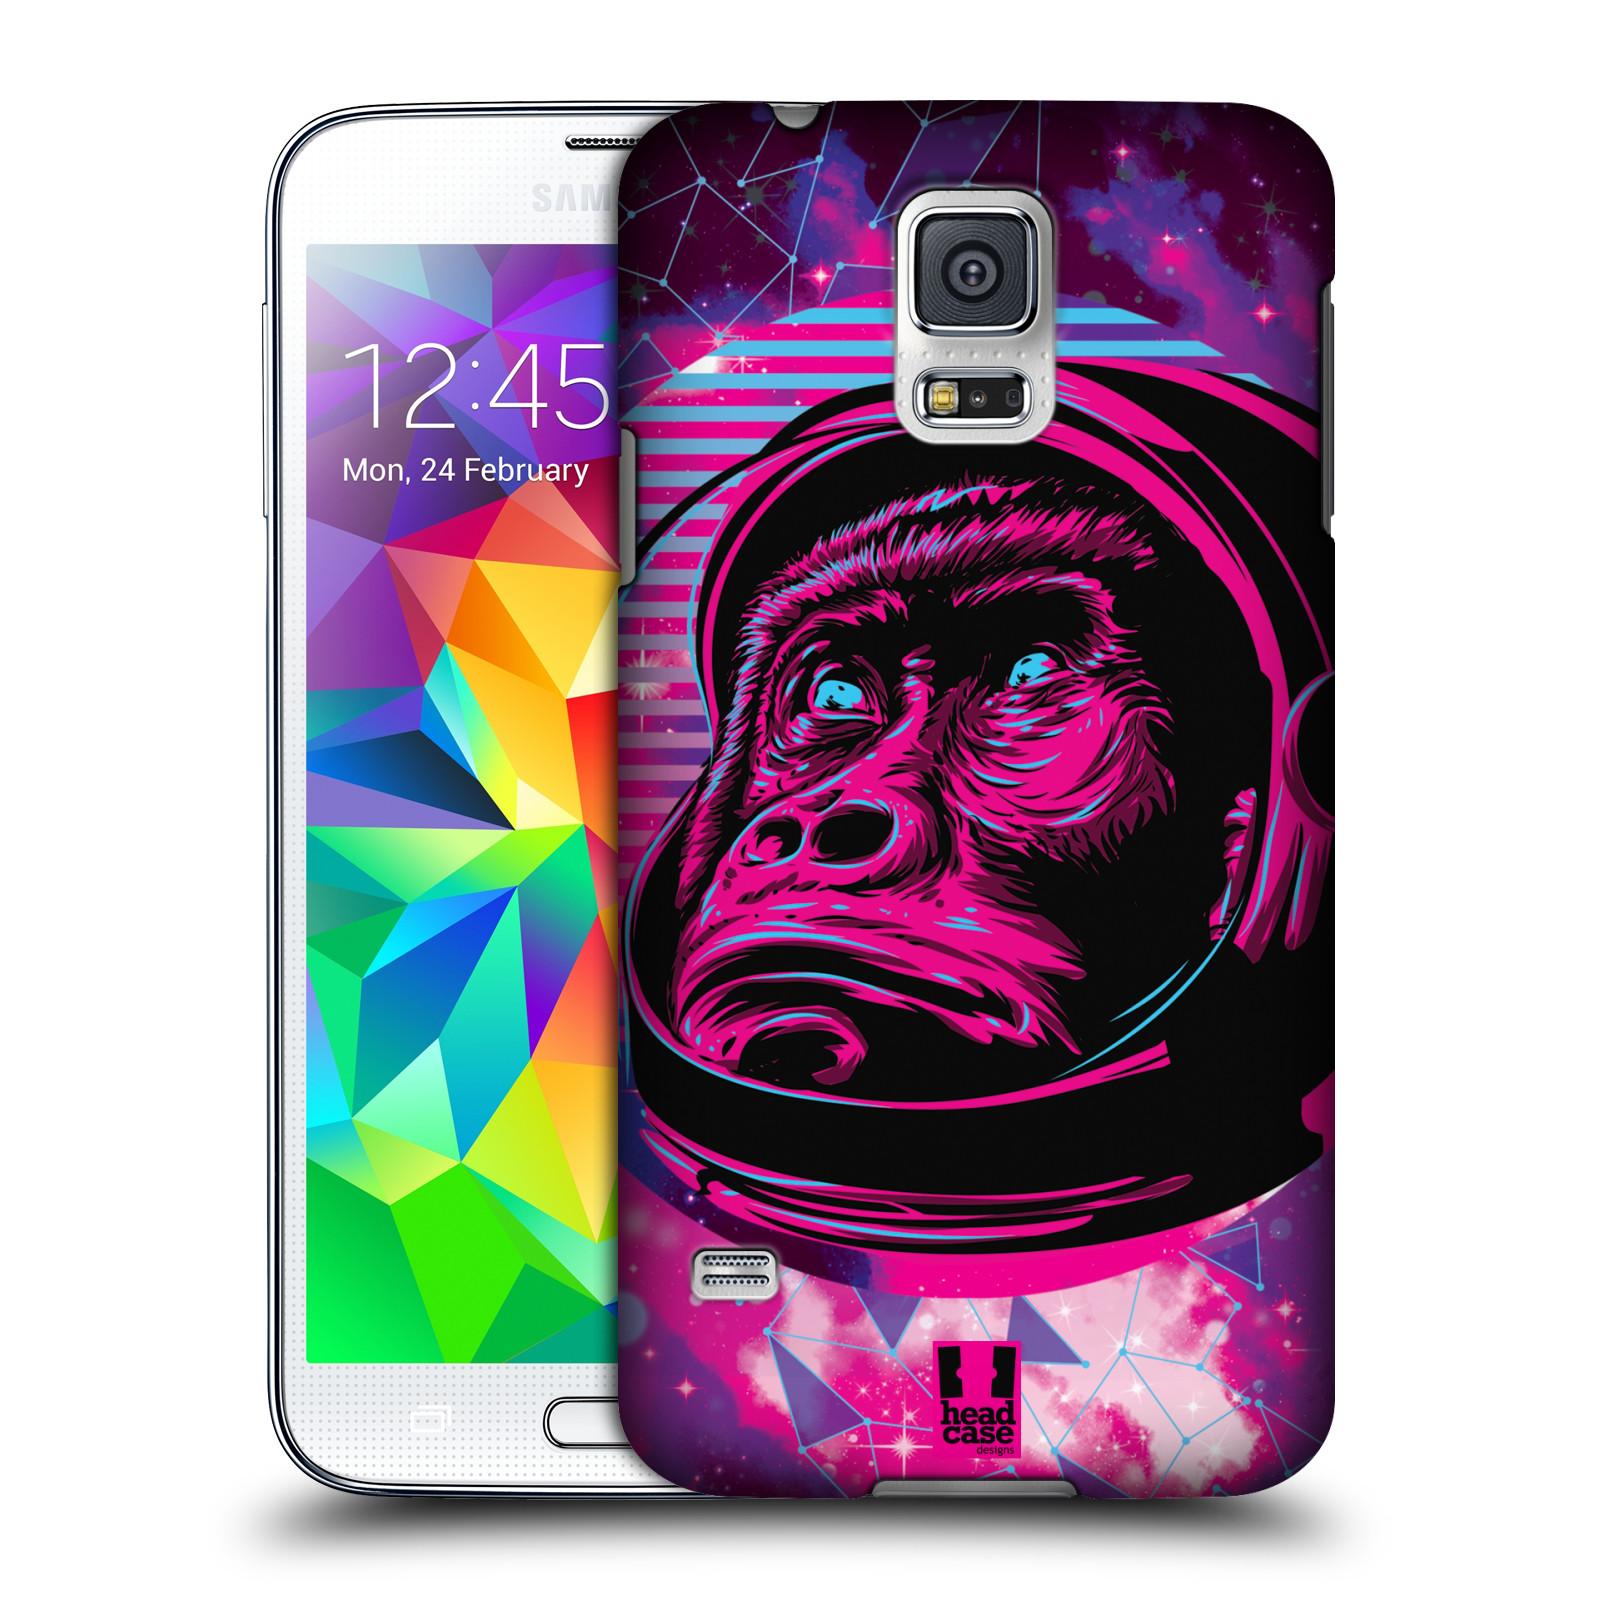 Plastové pouzdro na mobil Samsung Galaxy S5 Head Case - Gorila ve skafandru